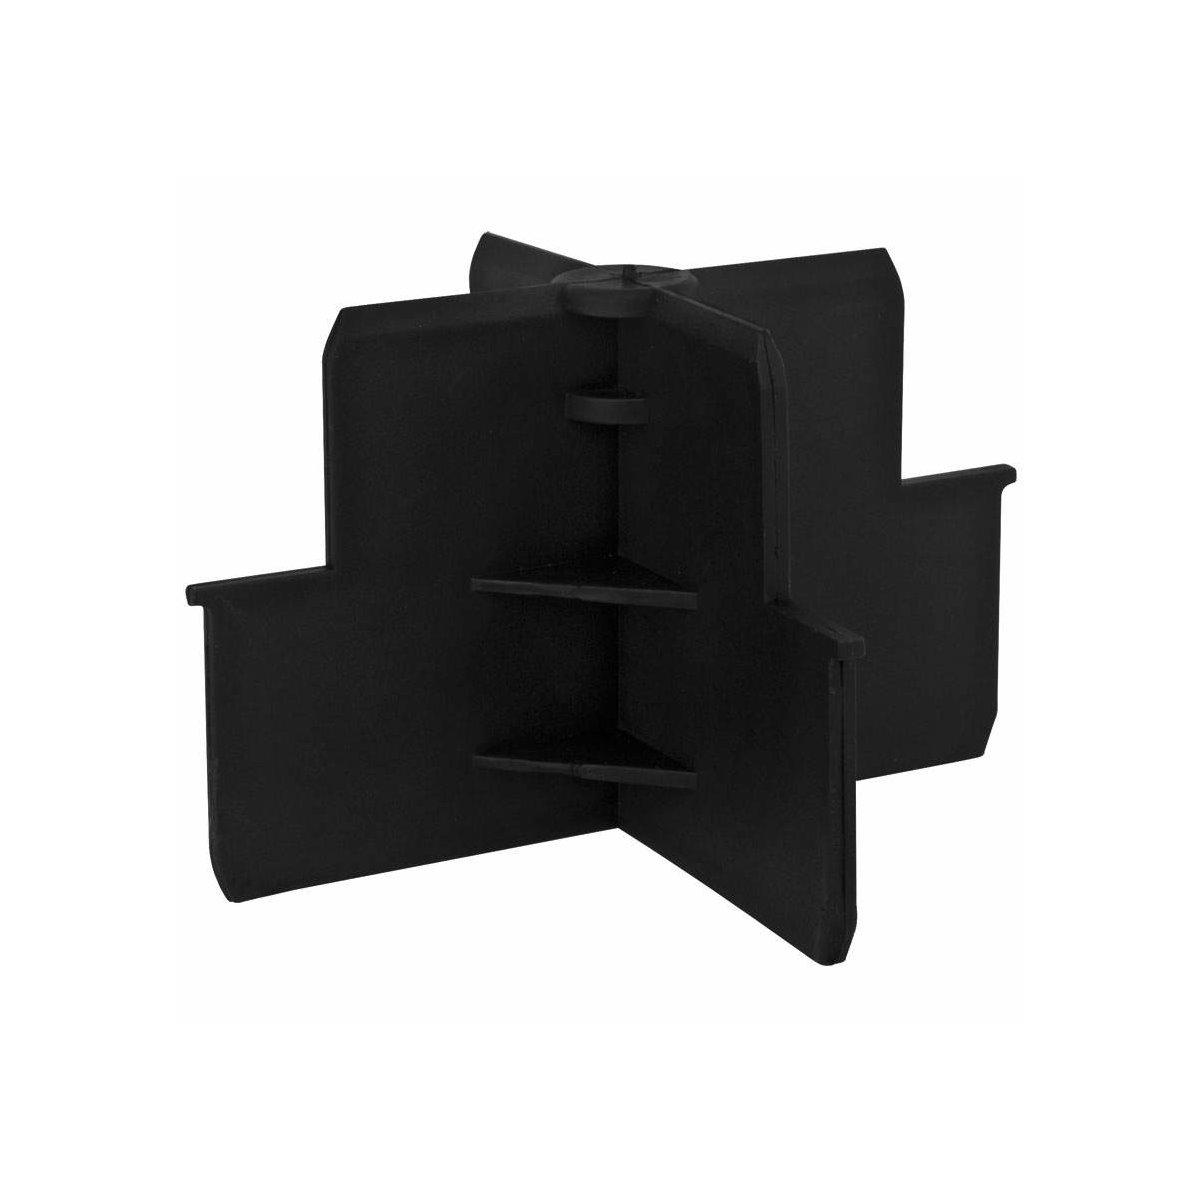 steckdosens ule 2 fach gartensteckdose zeitschaltuhr gr. Black Bedroom Furniture Sets. Home Design Ideas